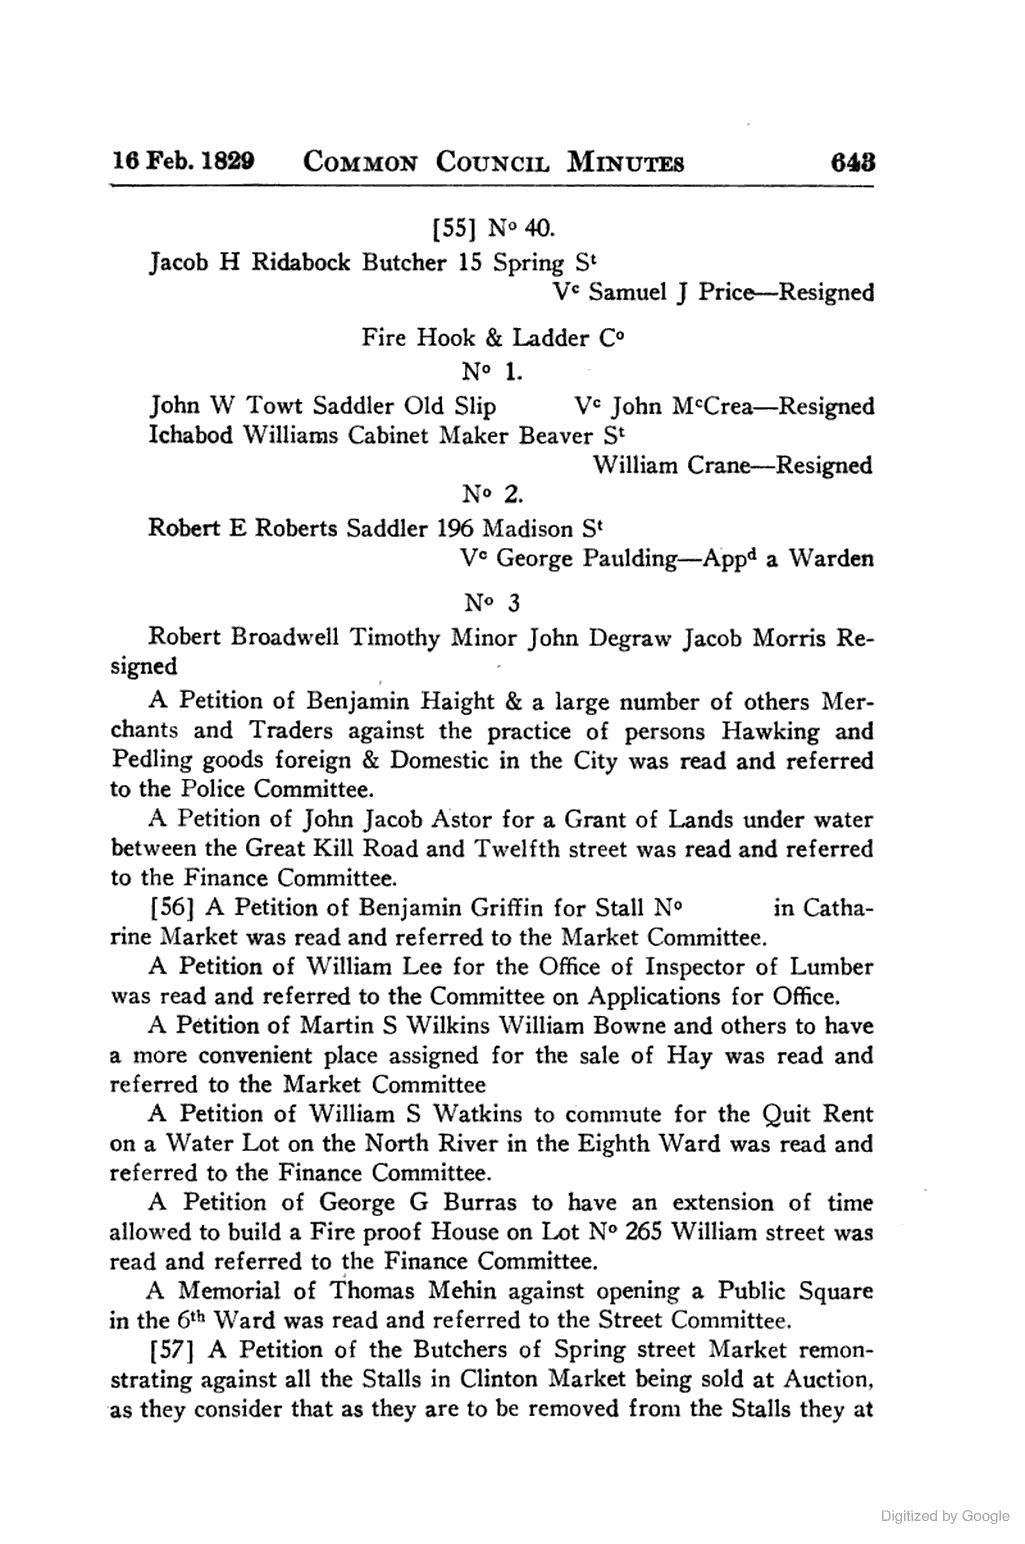 RIDABOCK Jacob, 1830. BUTCHER, 15 Spring St. Minutes Of